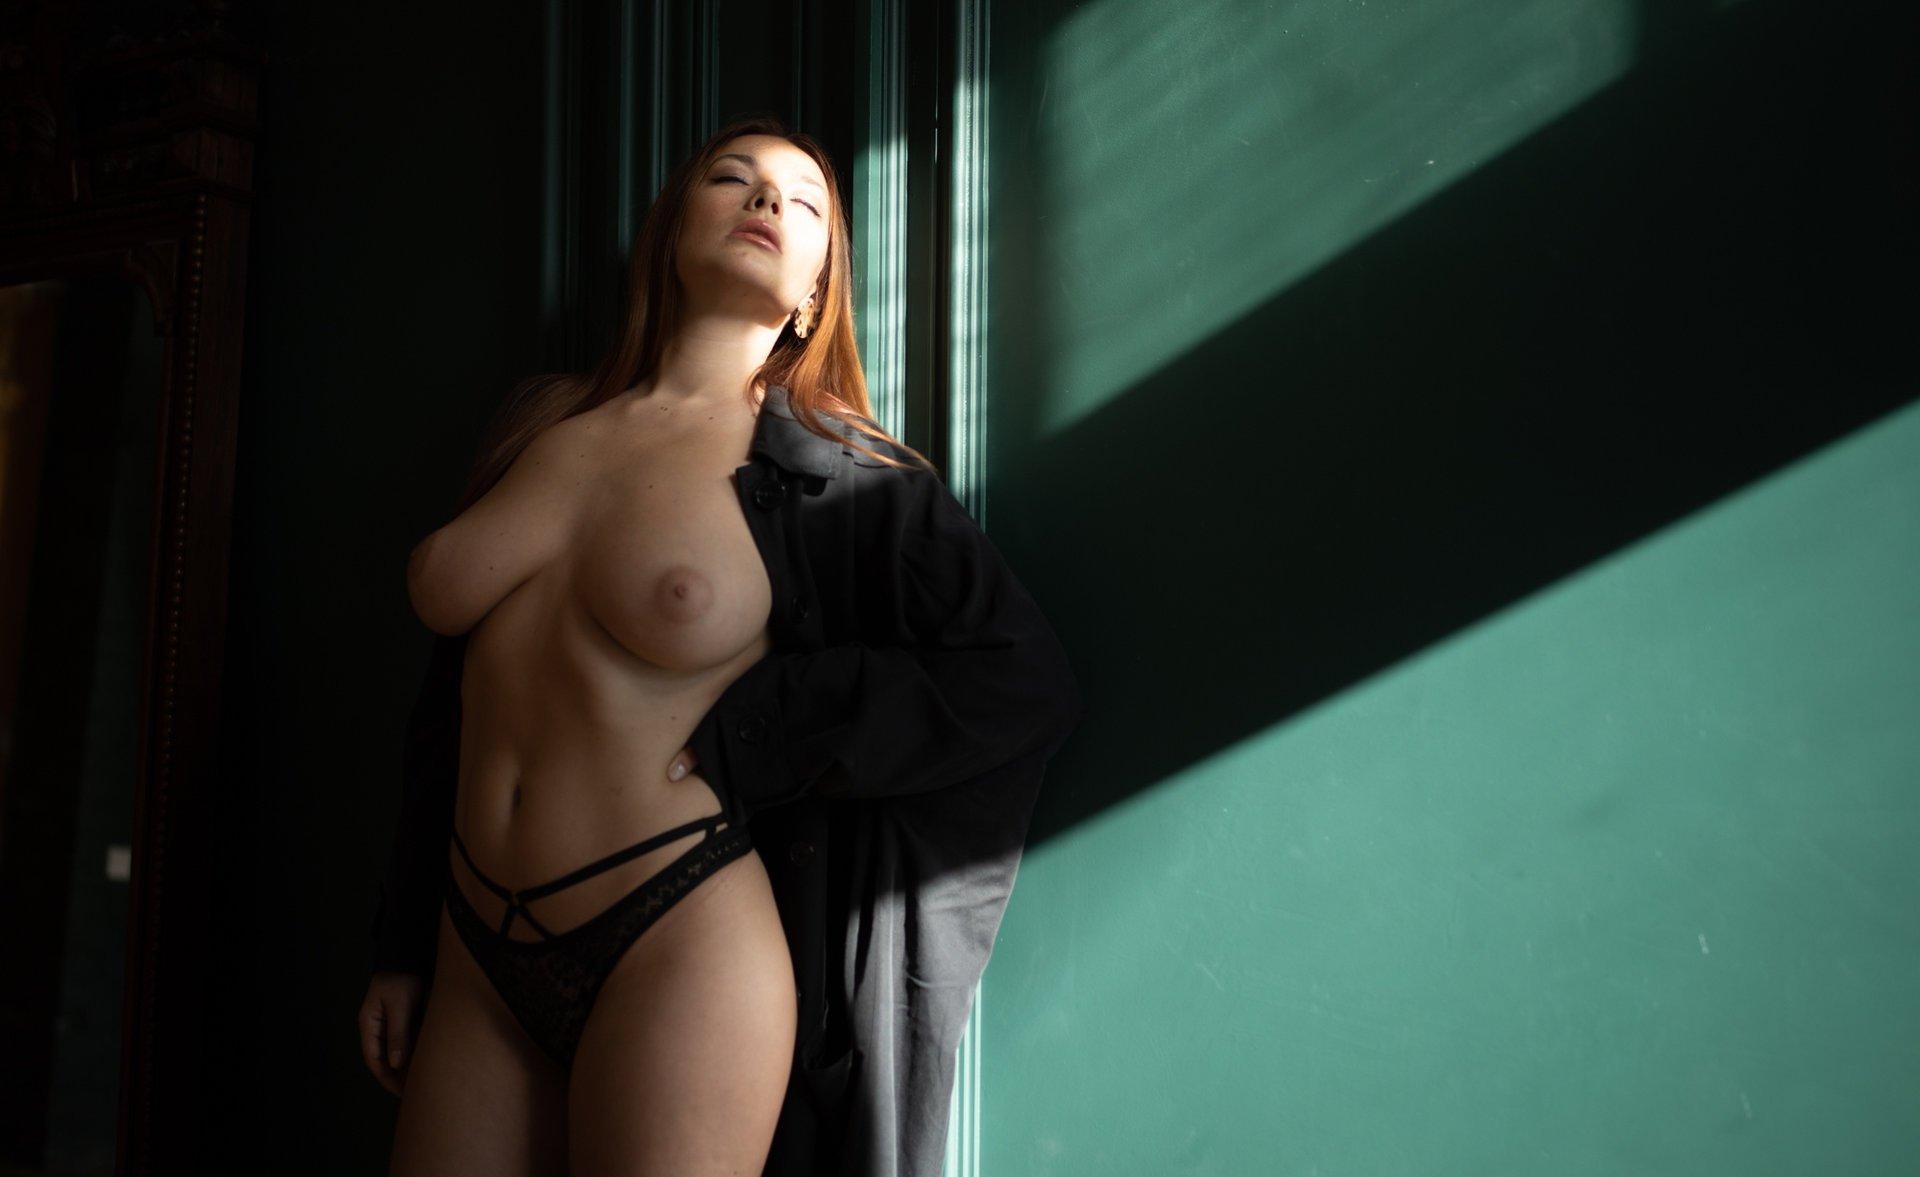 Olga Kobzar Bugs Bunny Gf Nudes Leaks 0020